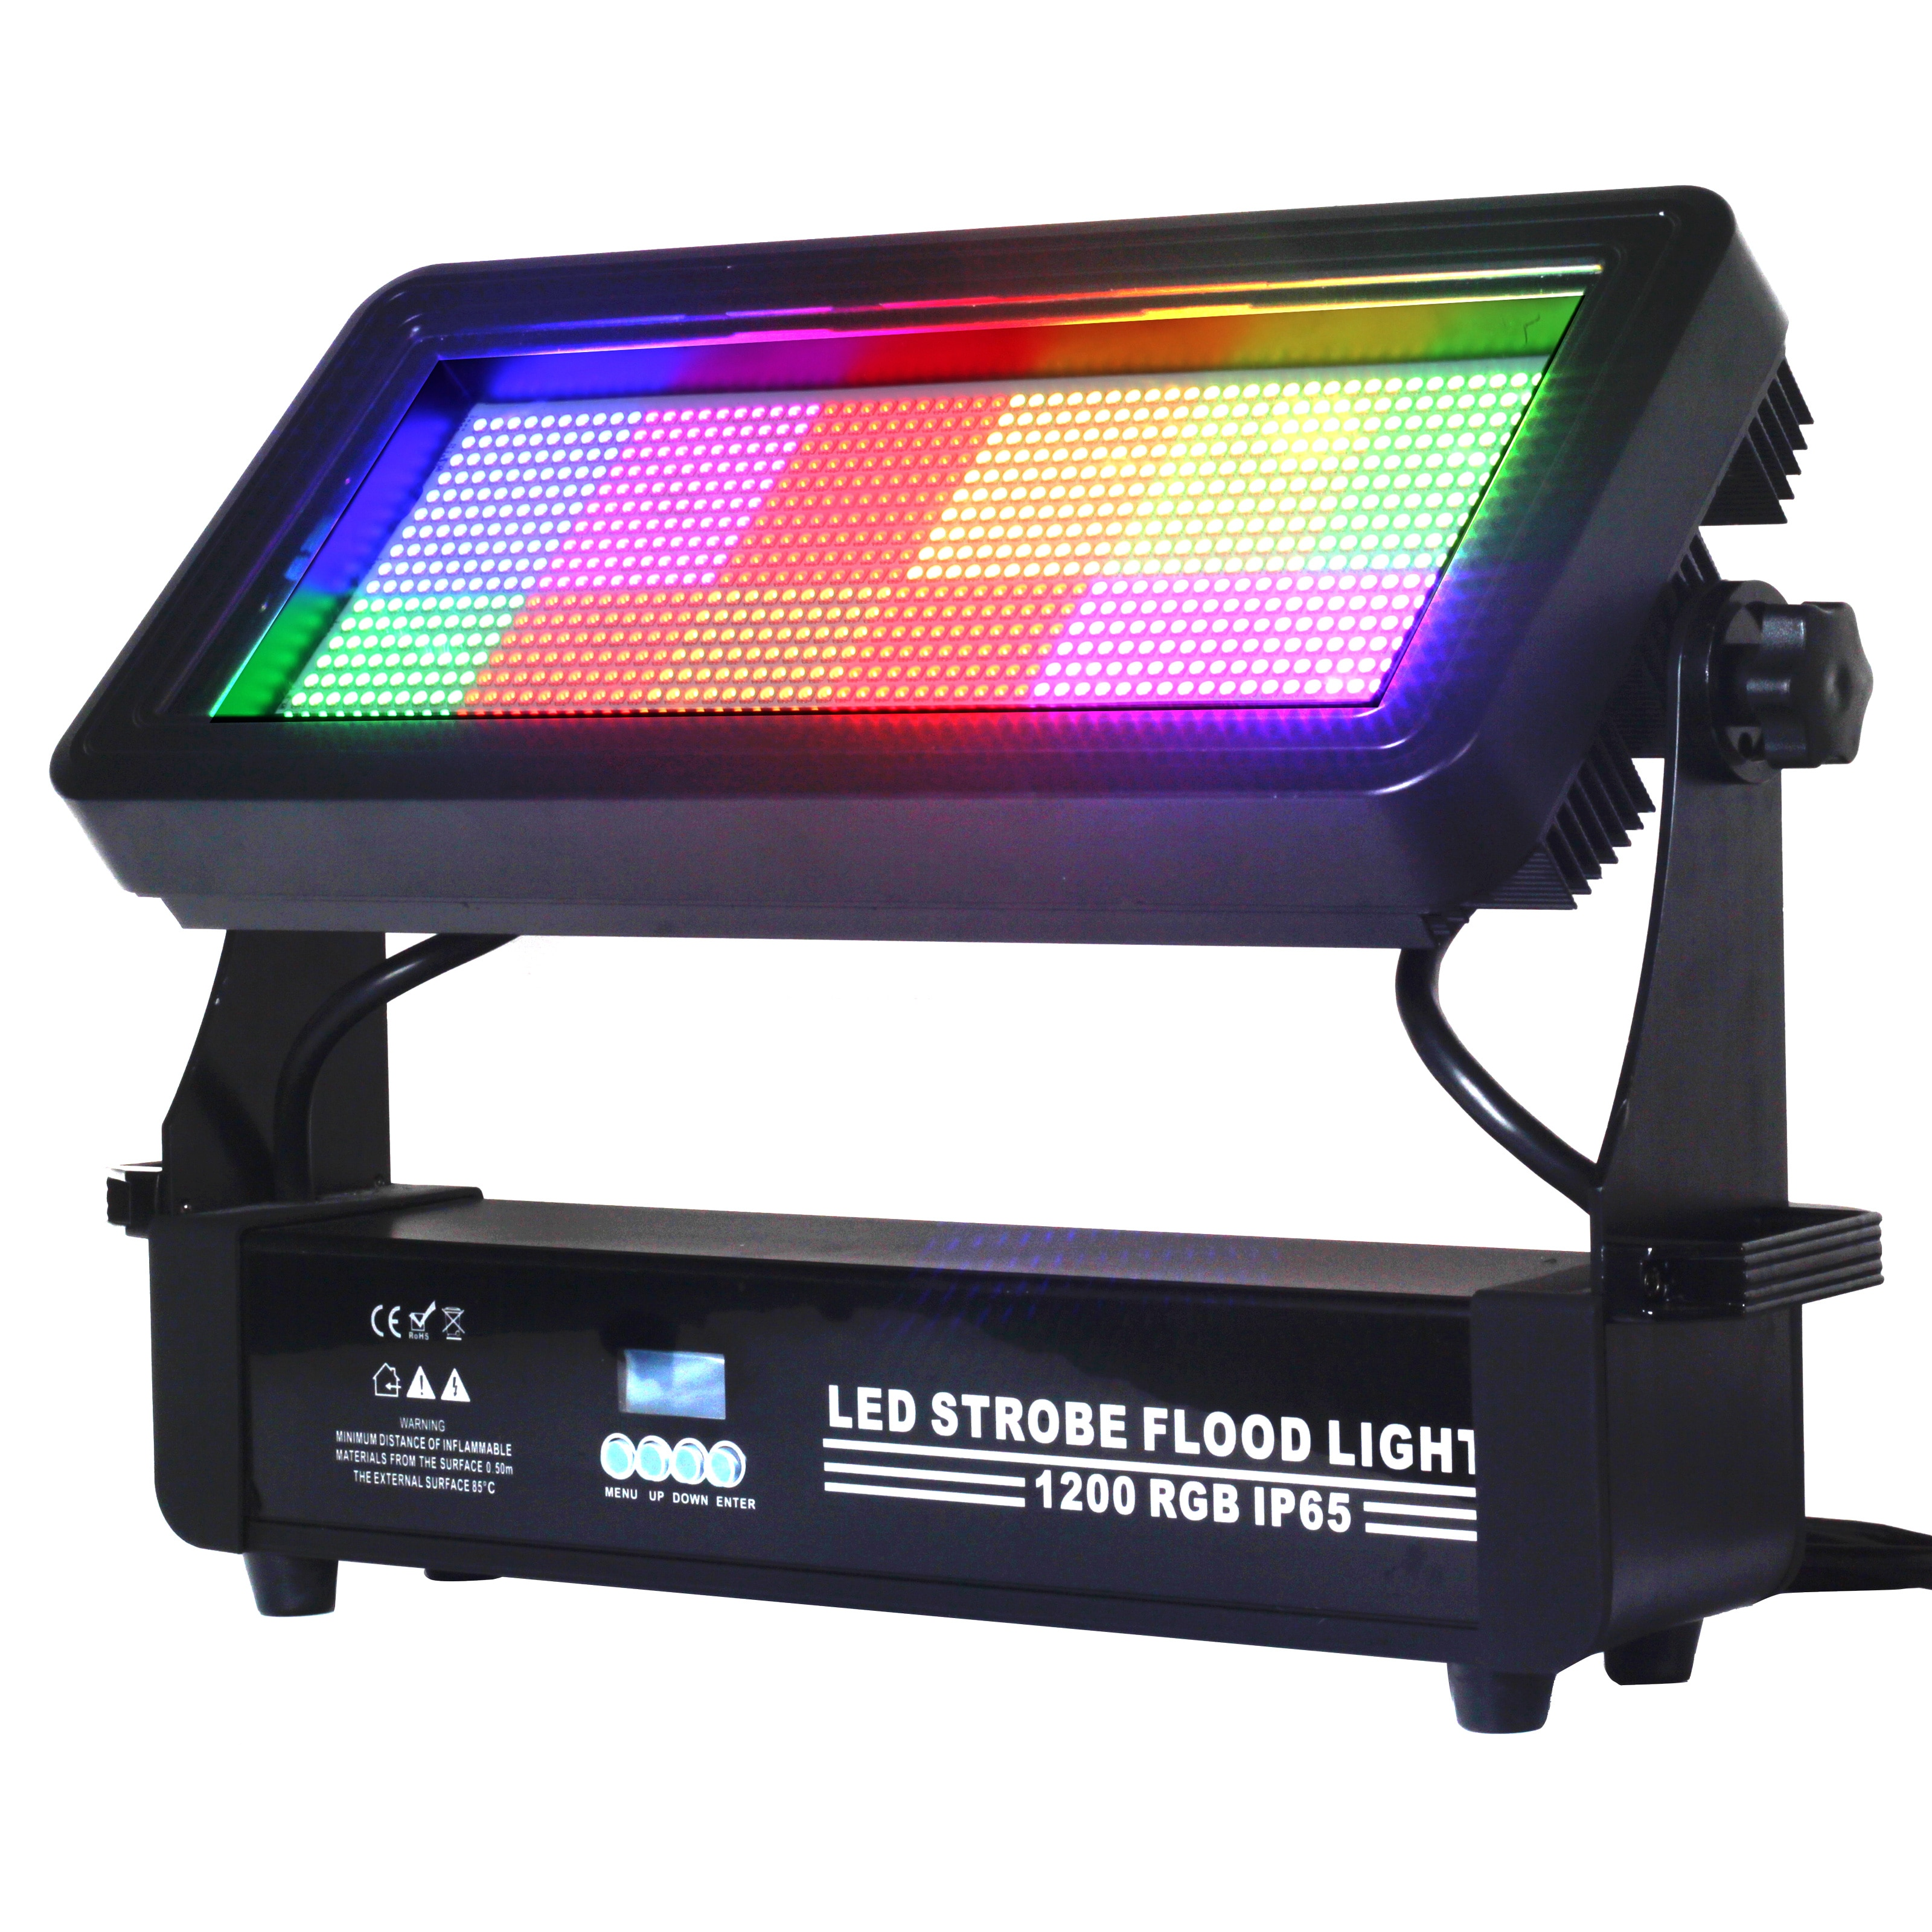 1200 LED ستروب ضوء 1000W IP65 المرحلة وامض الإضاءة بار ديسكو DJ KTV الصوت المنشط مصباح المرحلة تأثير الإضاءة